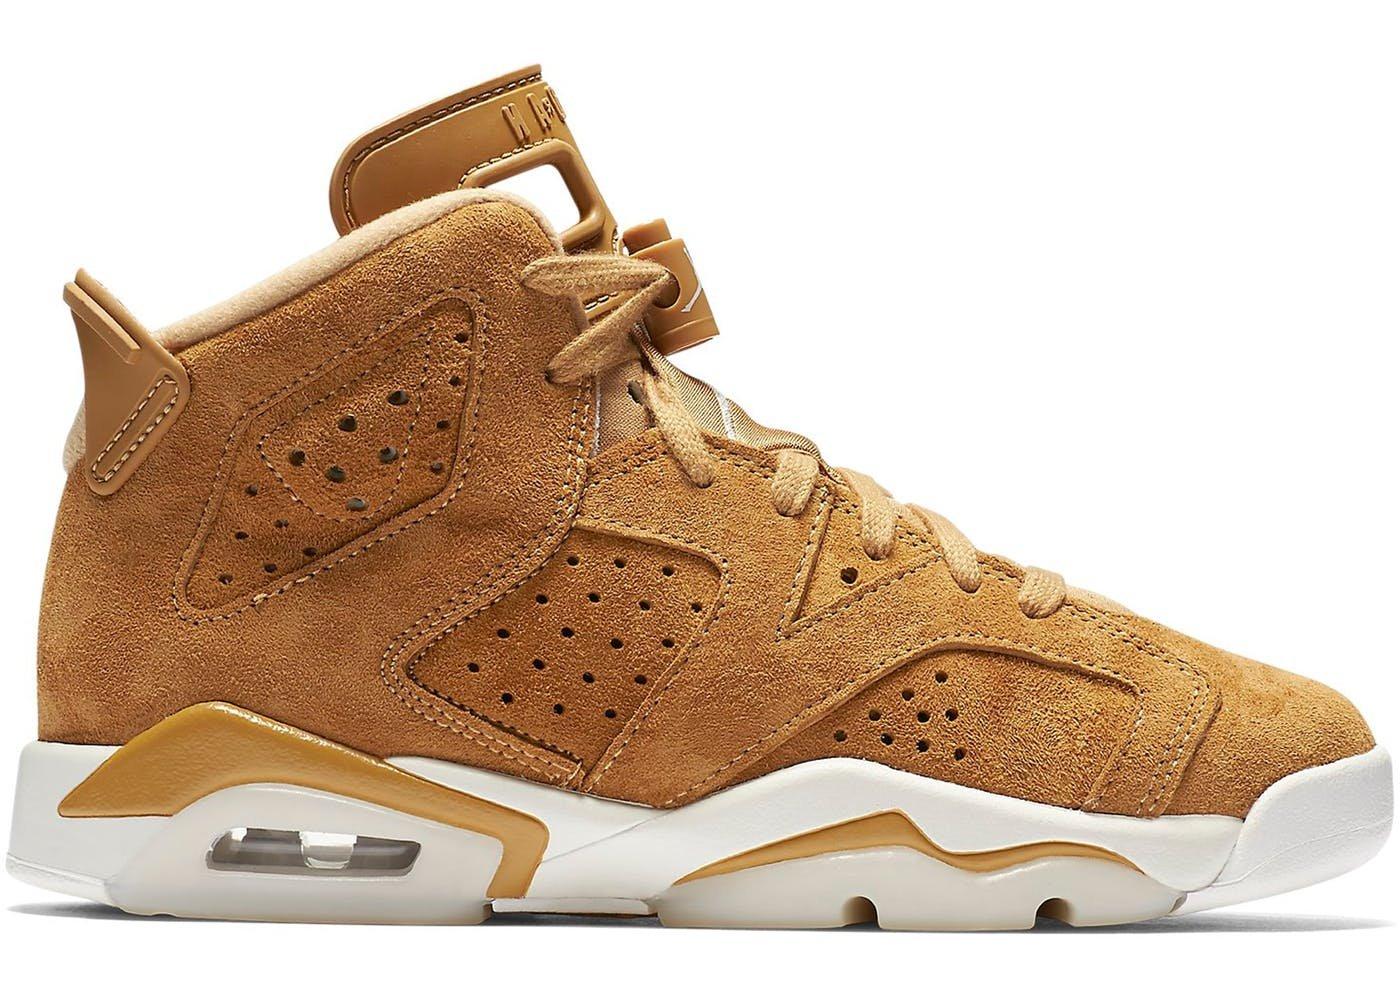 Nike Jordan Air Retro 6 Golden Harvest G.S Big Kids Youth Wheat 384665-705 (5.5) by NIKE